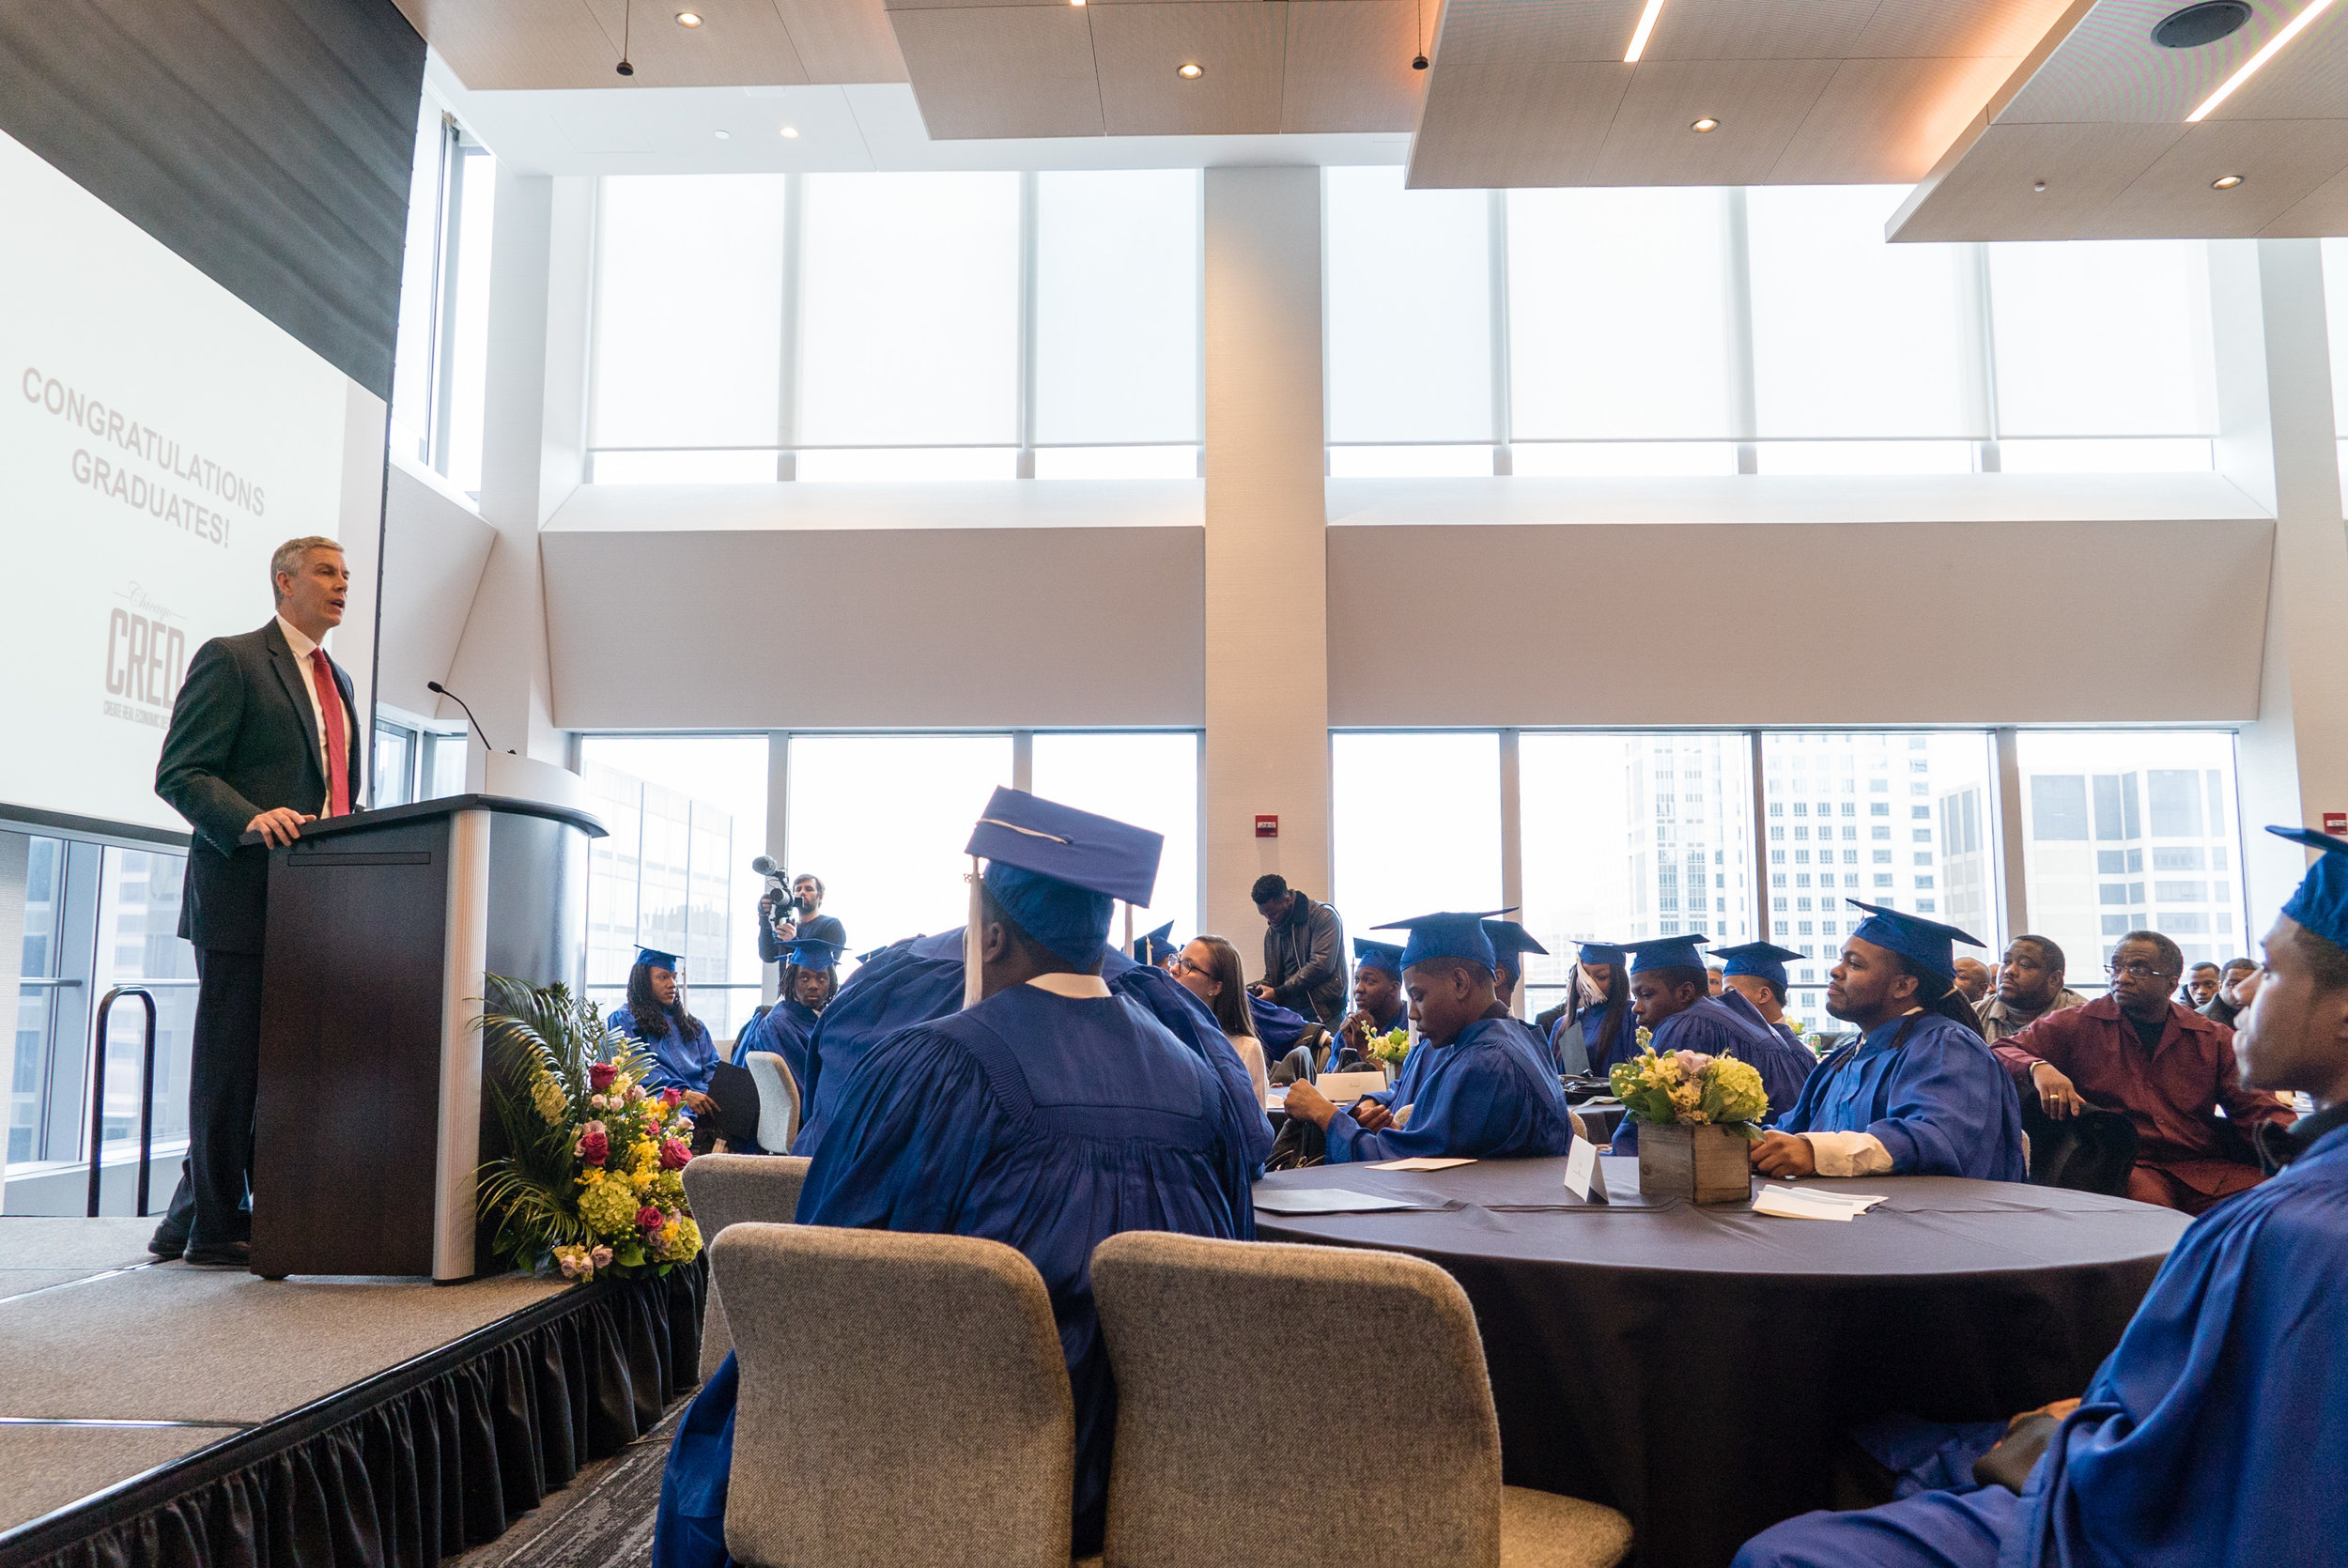 CRED_Graduation_Chicago_04062018-4.jpg